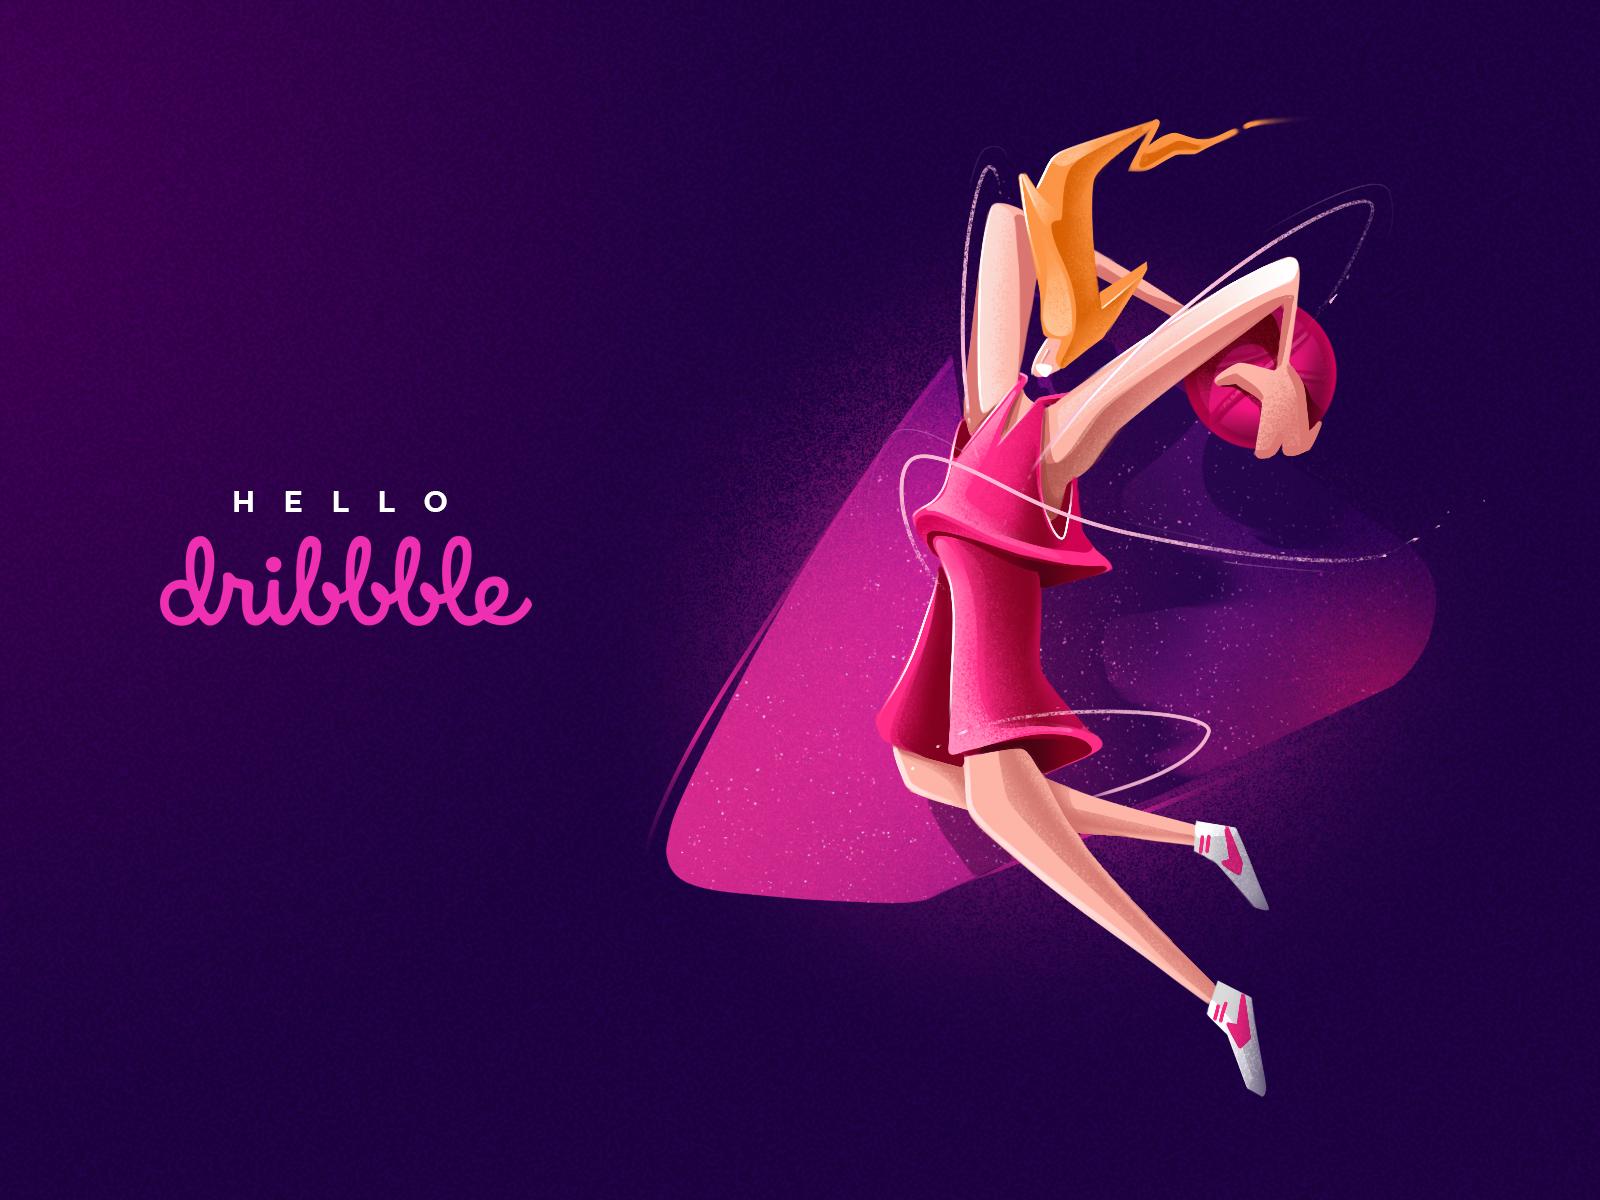 X hello dribbble 2x 4x